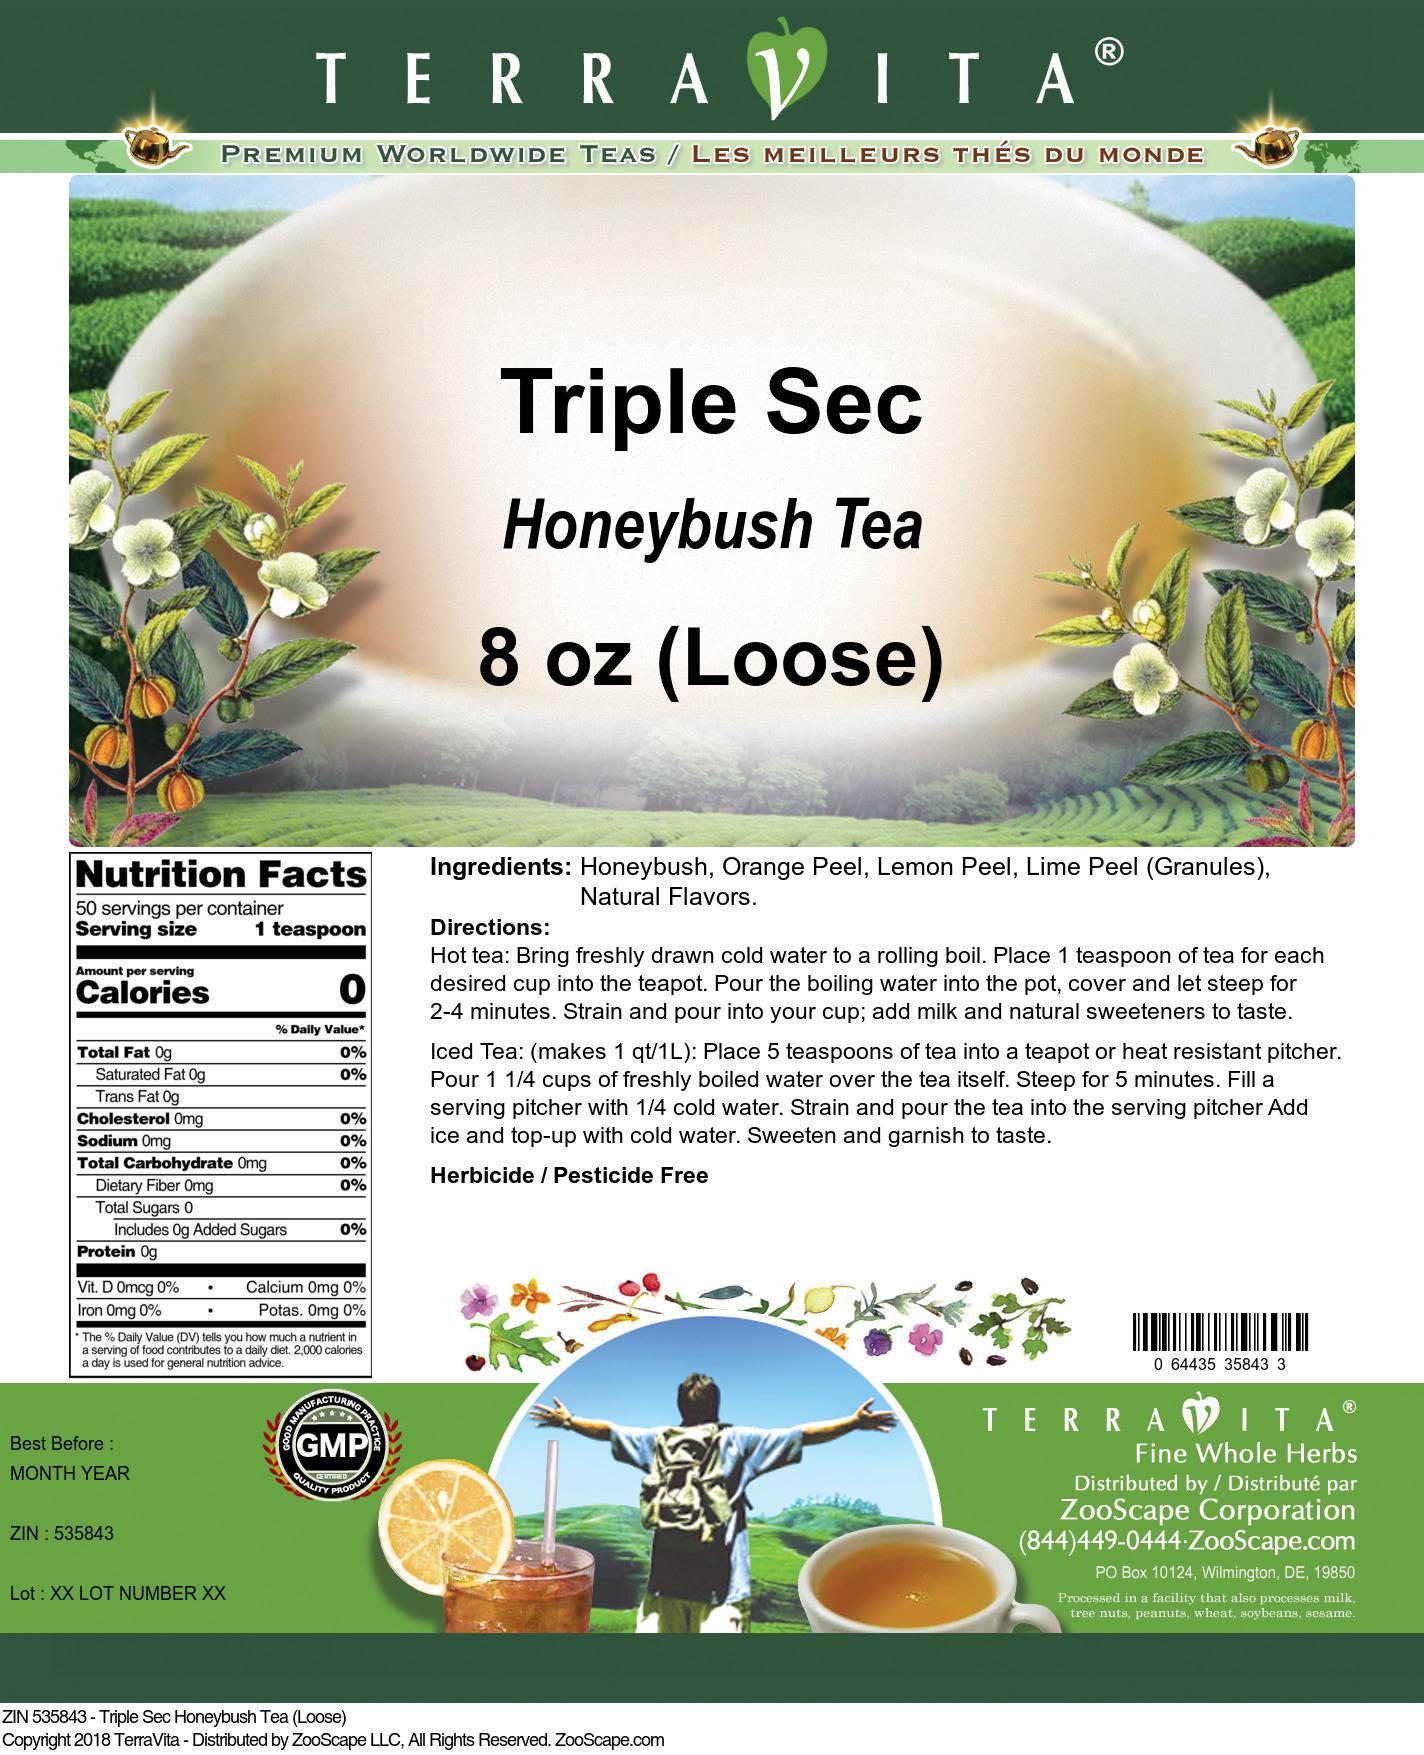 Triple Sec Honeybush Tea